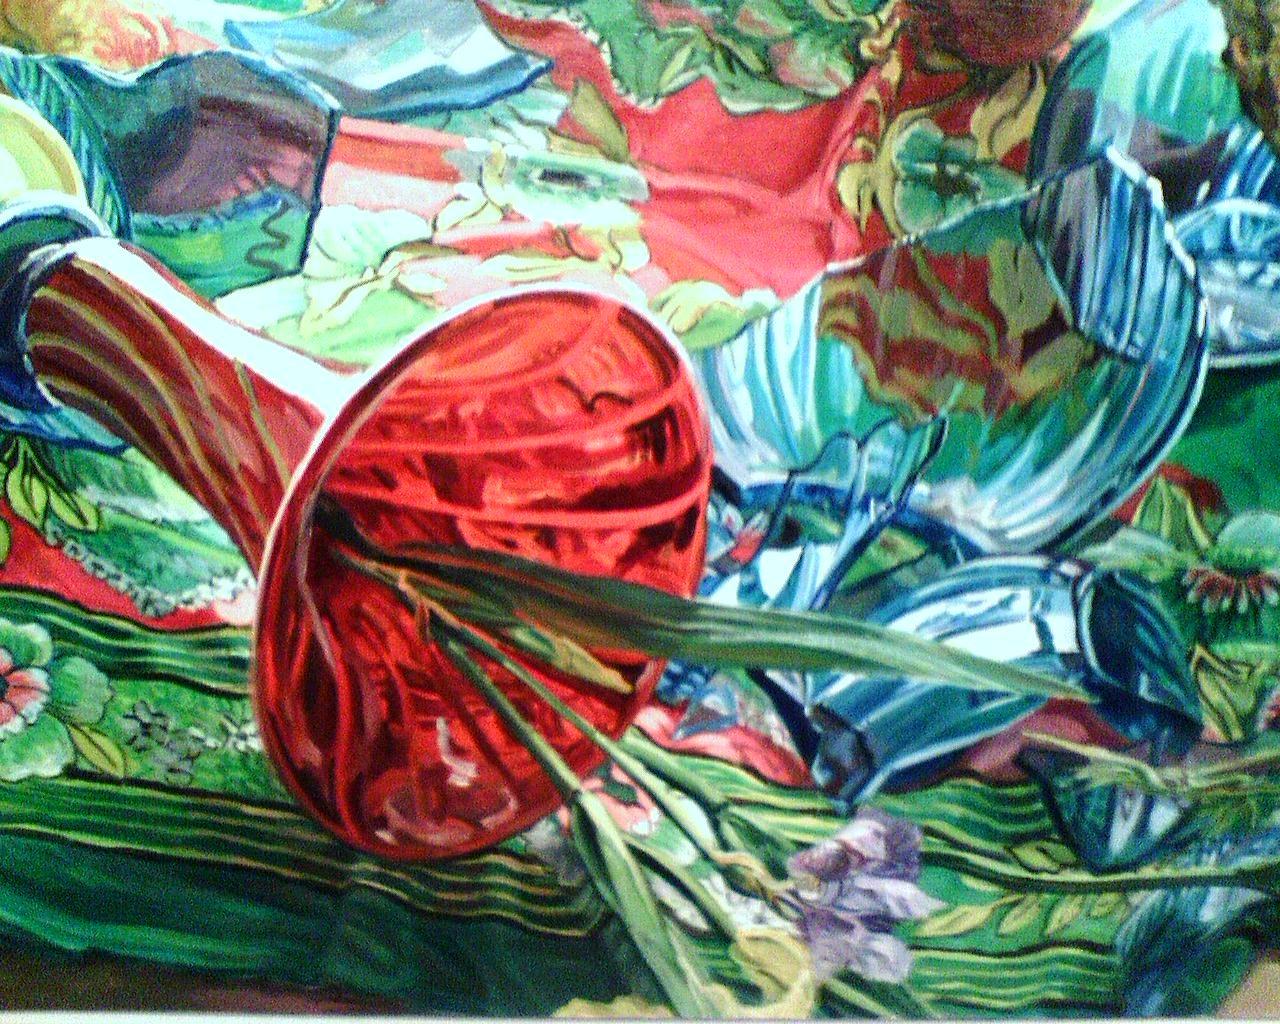 Watercolor art history - Art History Janet Fish The Daily Telecraft Fish Bone Garden